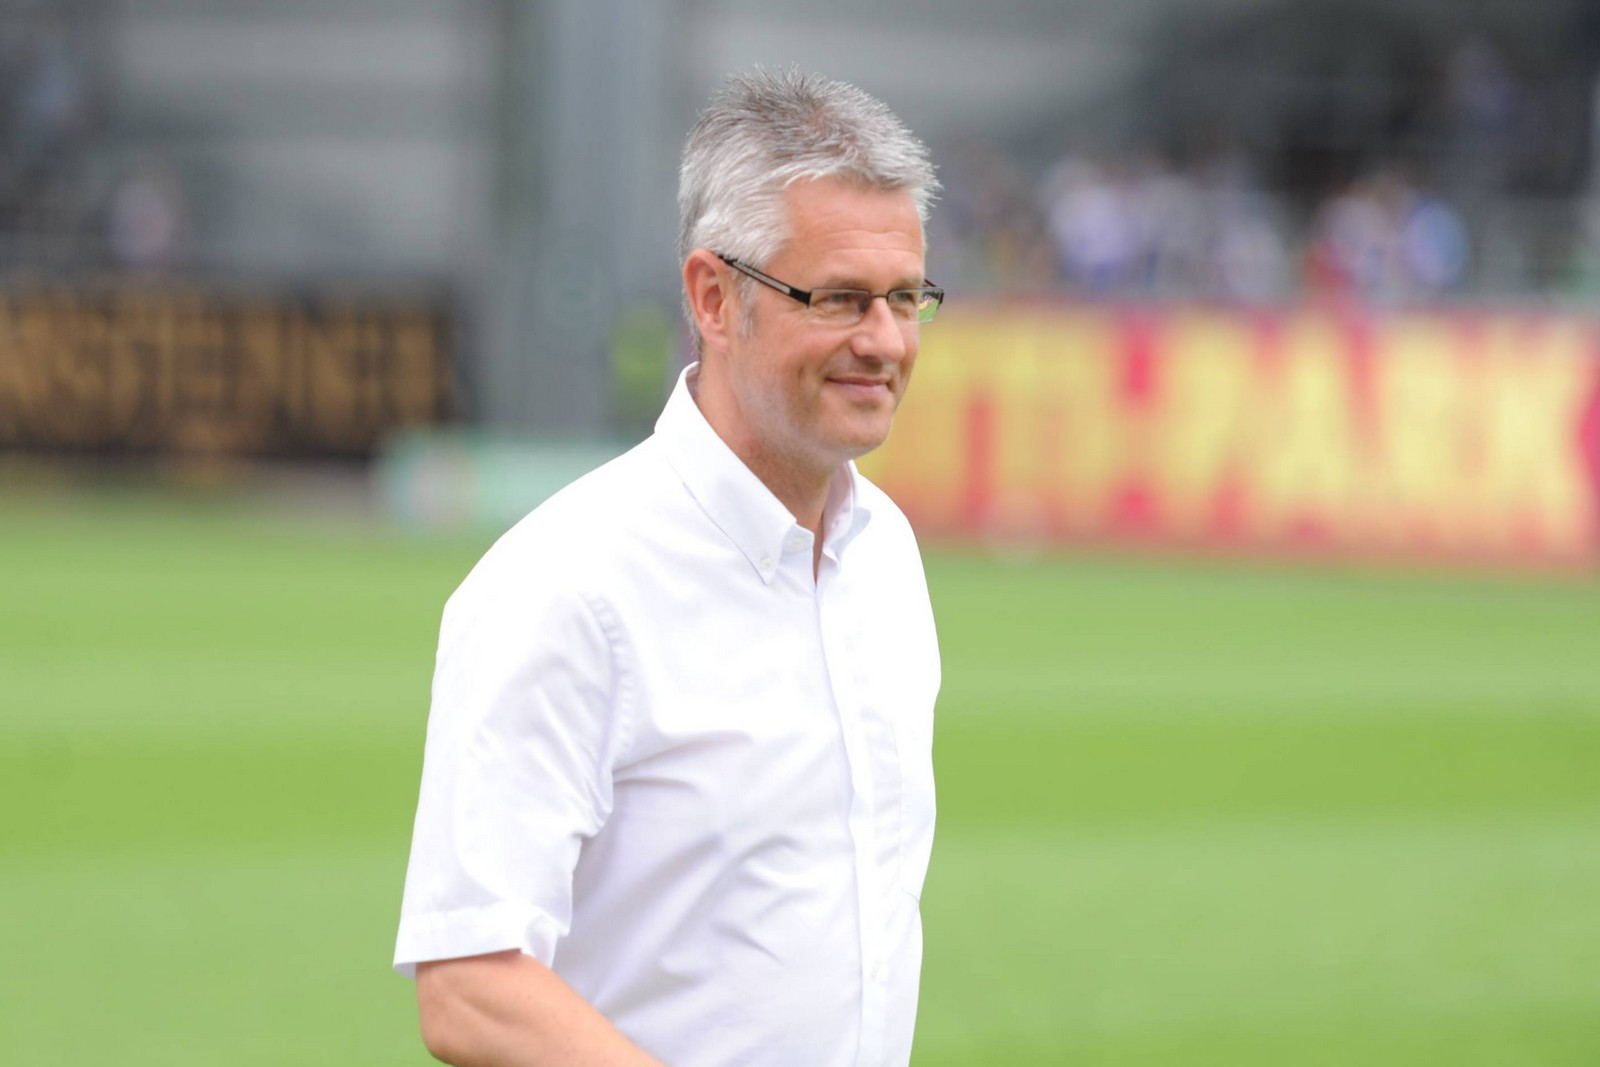 Ralf Heskamp, Sportdirektor HFC